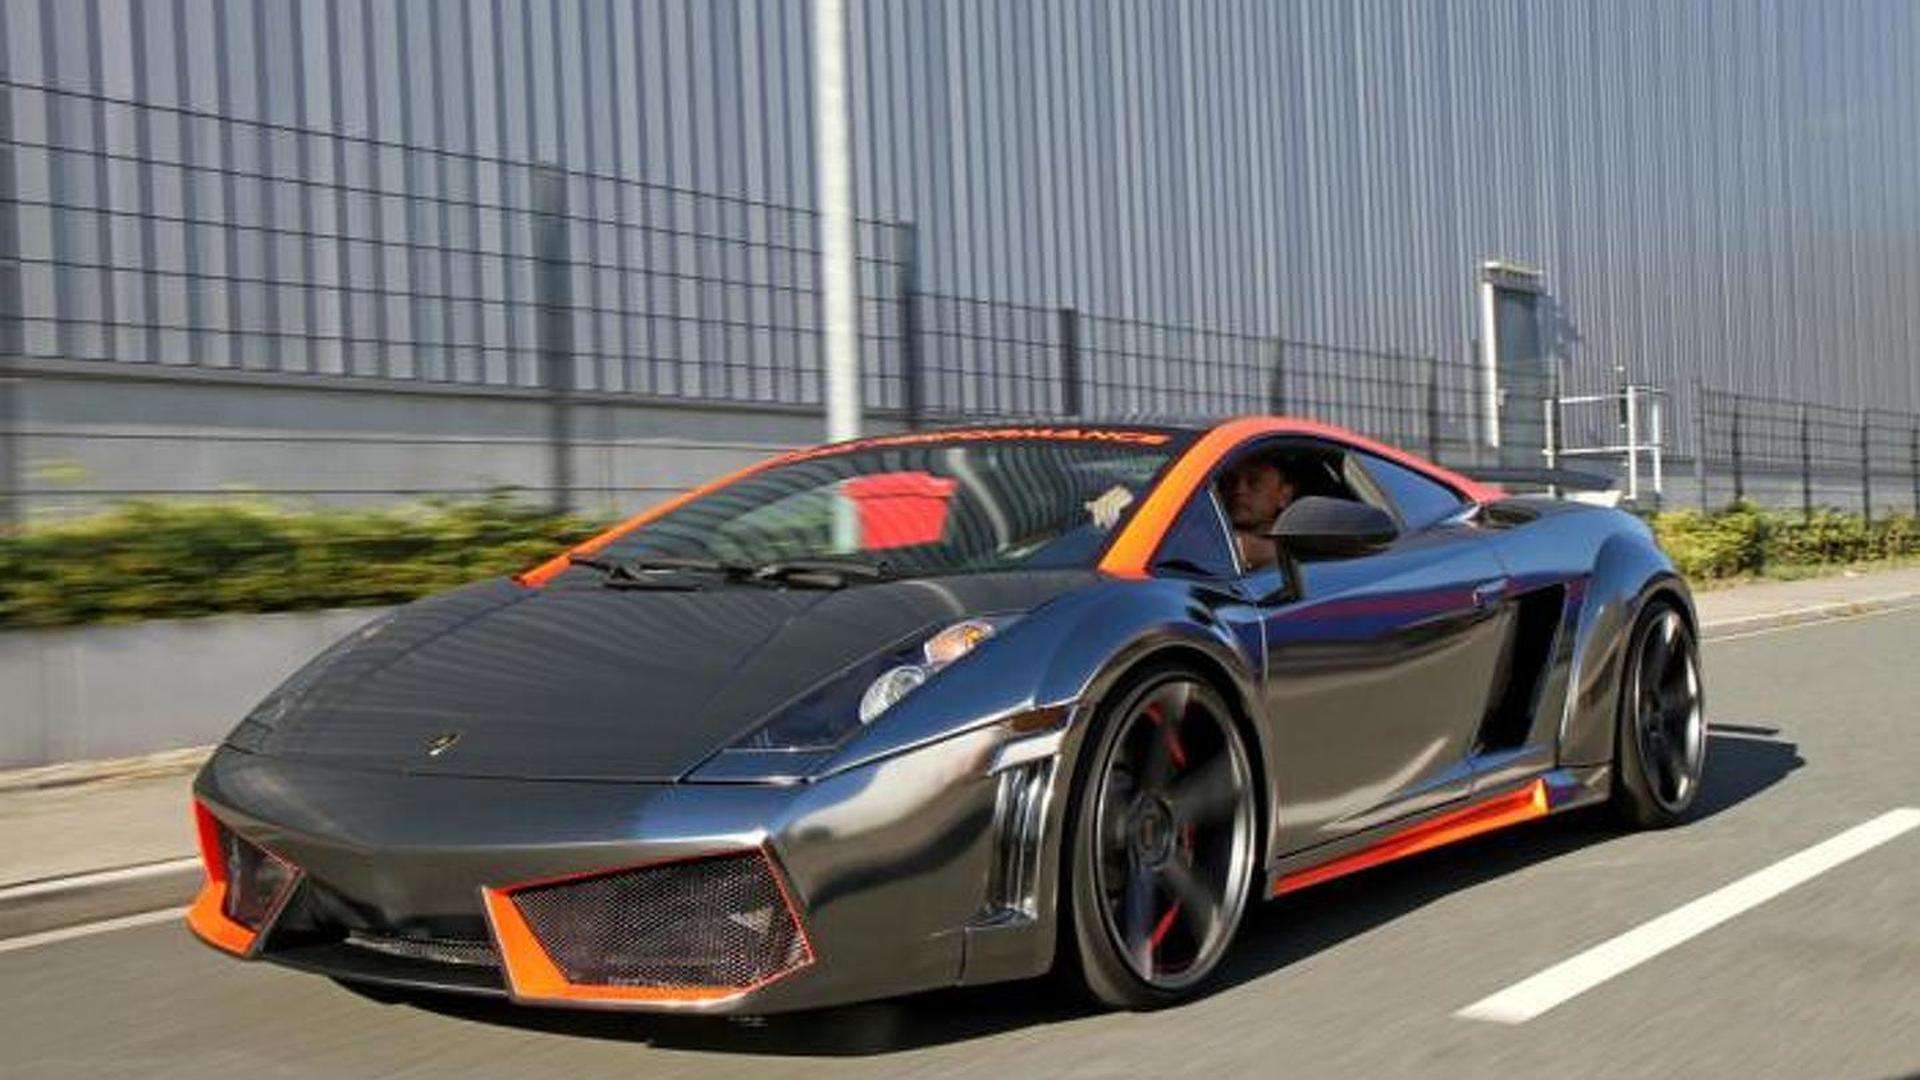 Lamborghini Gallardo gets air suspension and power hike from xXx Performance